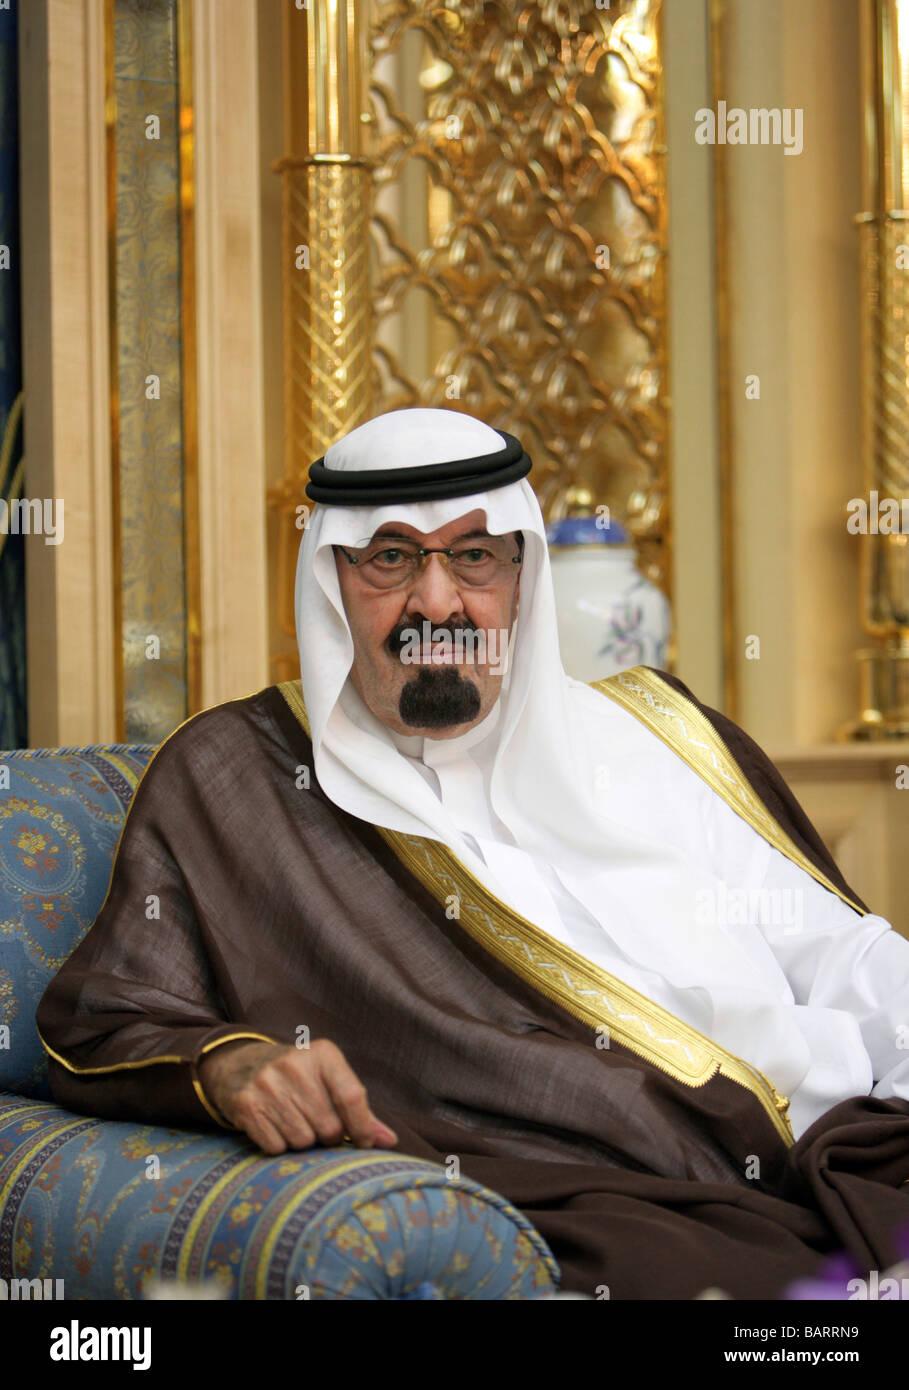 Abdullah bin Abdul Aziz Al Saud King of Saudi Arabia - Stock Image